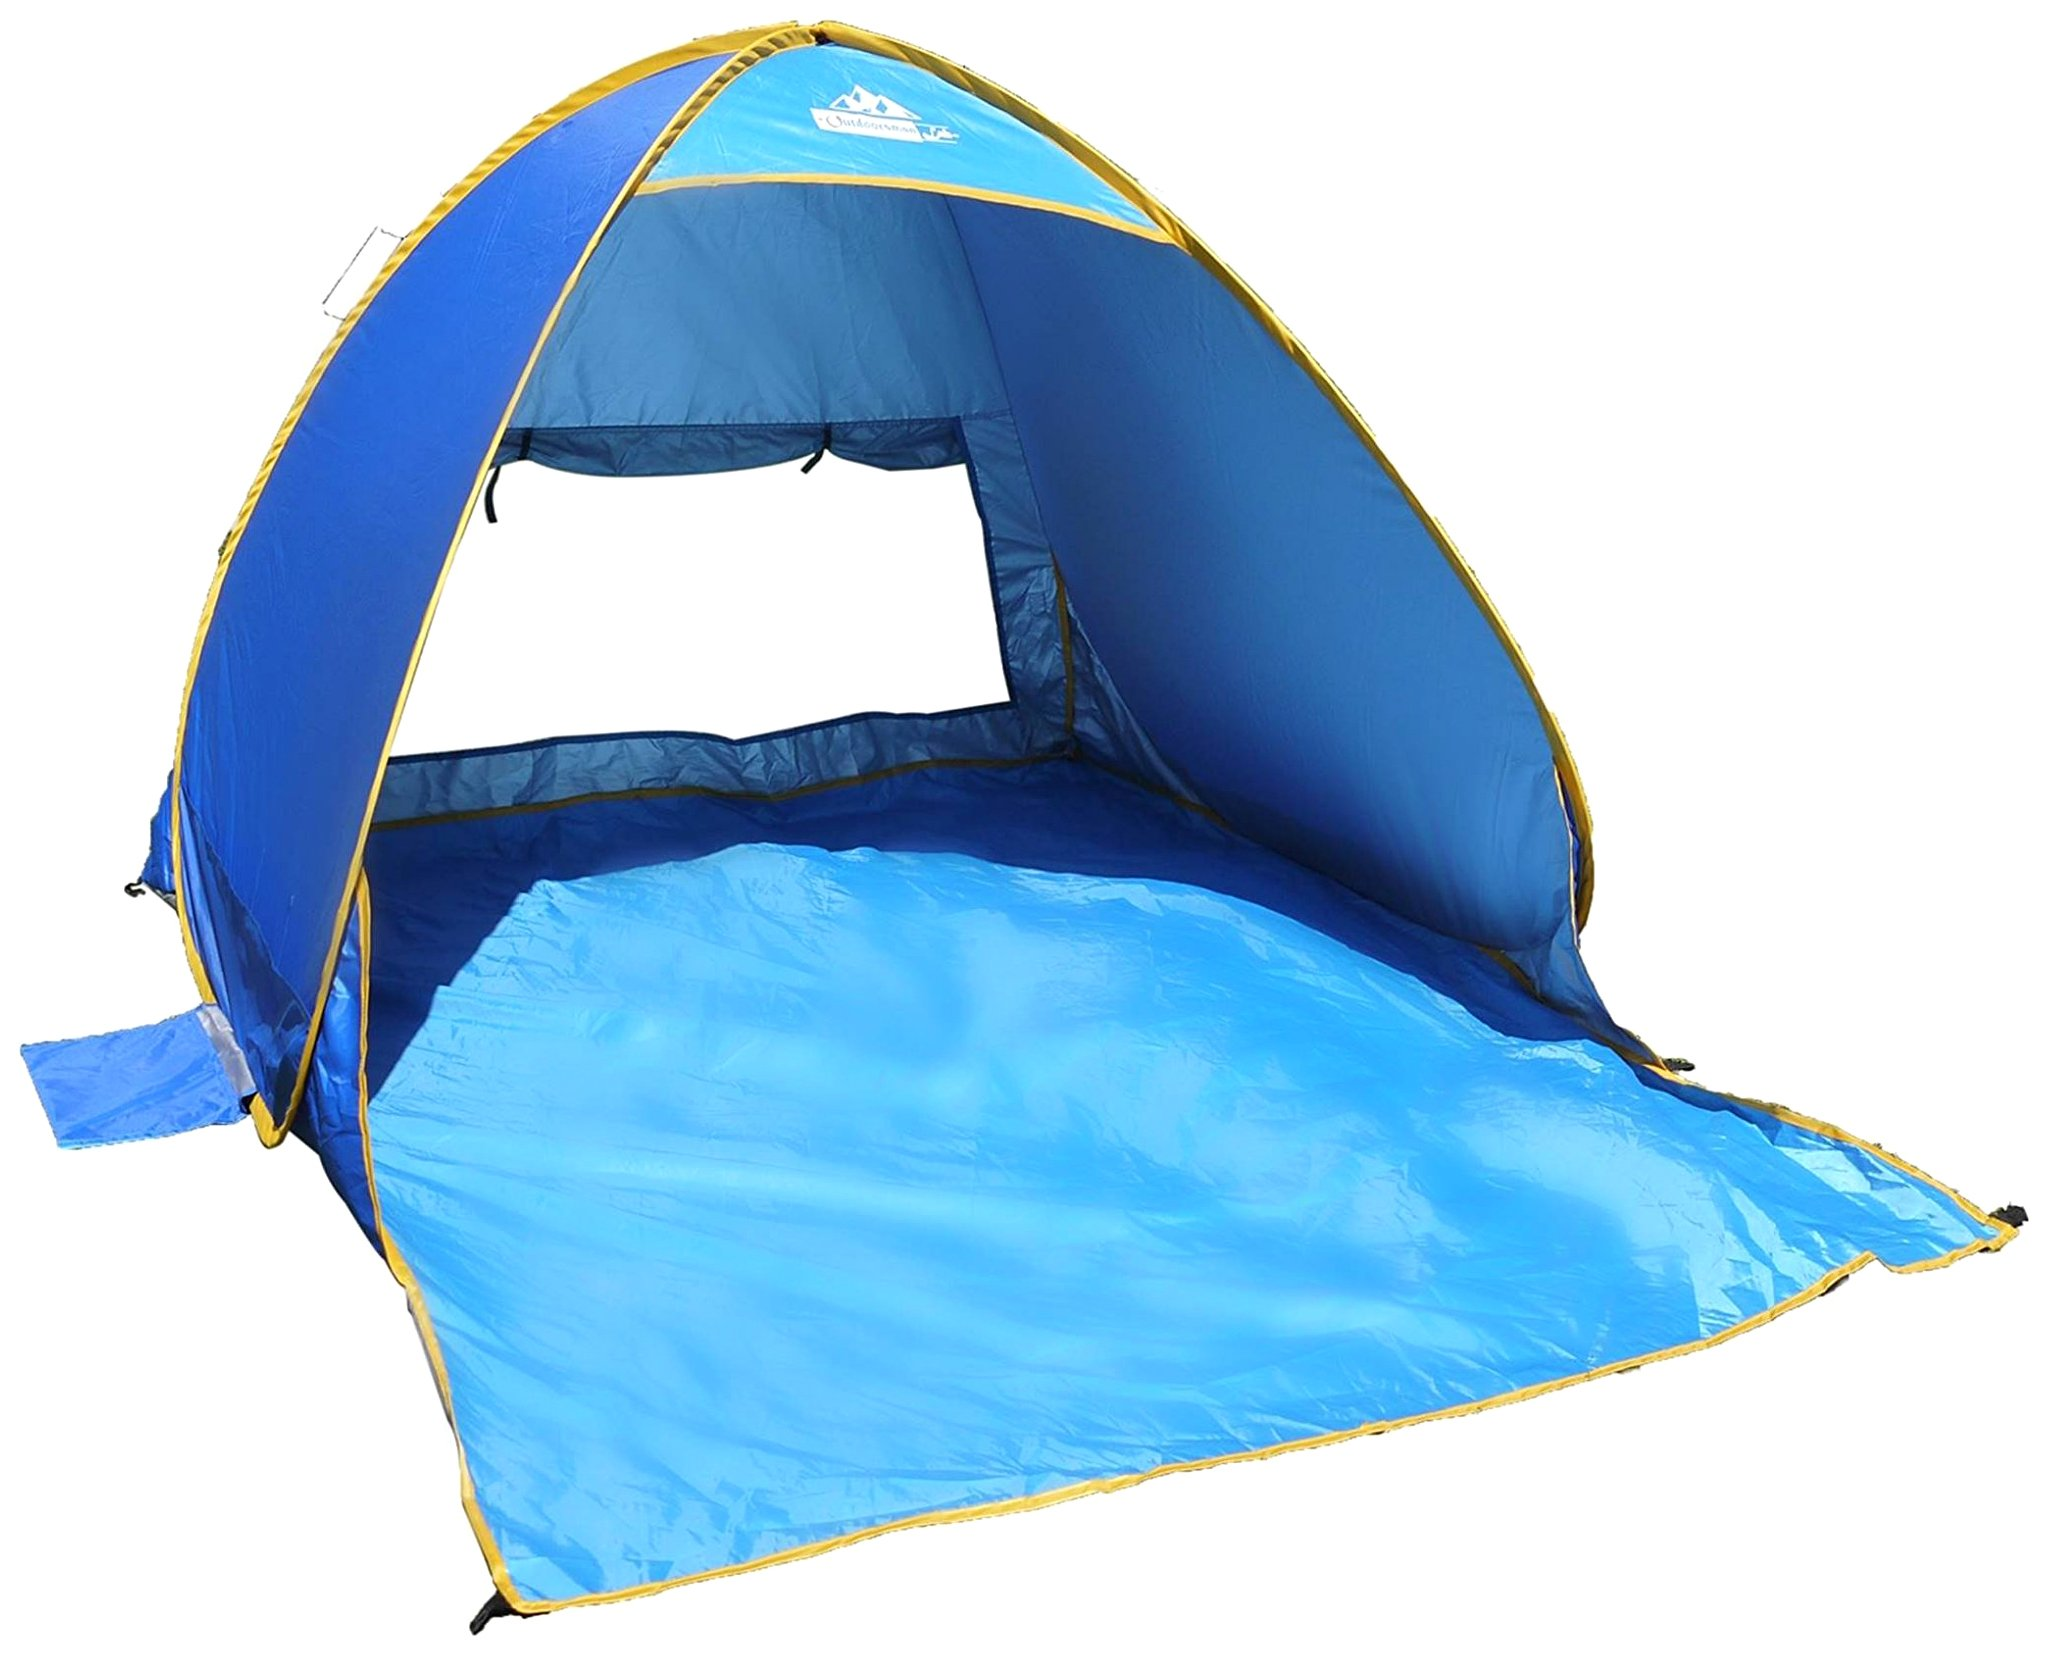 Outdoorsman Lab Beach Accessory u2013 17.7u201d x 17.7u201d x 1.2u201d Pop Up Beach Tent u2013 Use for Beach Vacation Travel Cabana Gear Sun Shelter Shade ...  sc 1 st  Amazon.com & Best wind tents for beach   Amazon.com